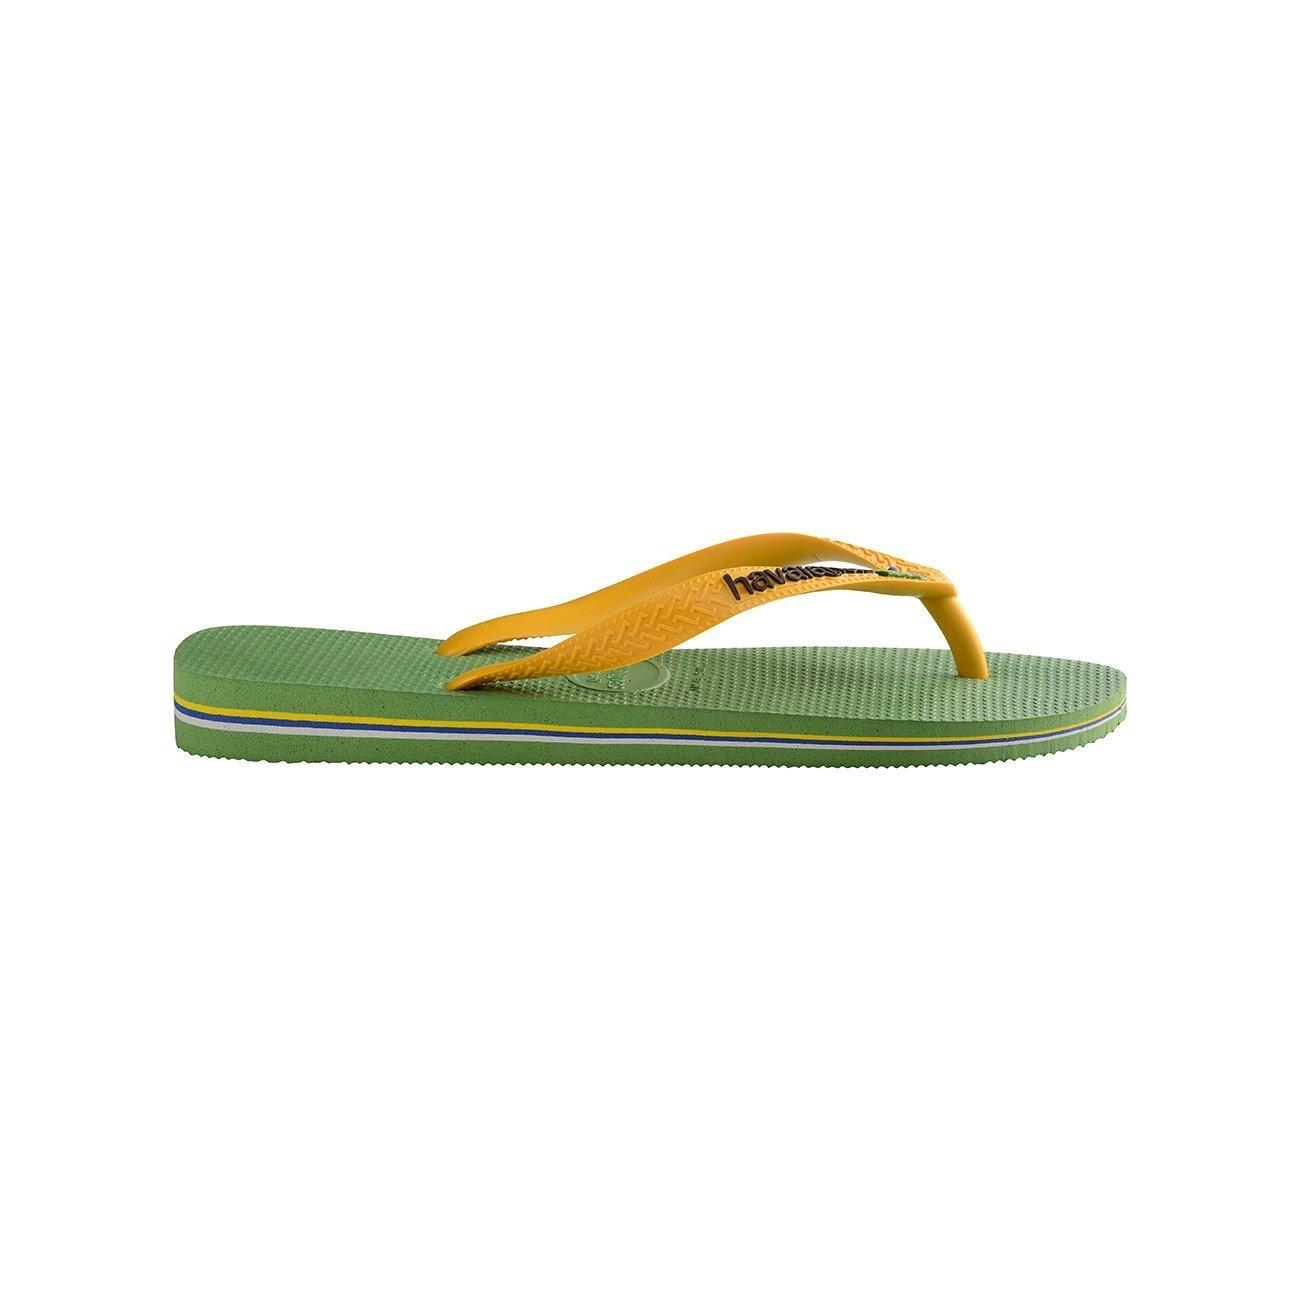 38c9a64575f Tong Havaianas Brasil Logo Green Bamboo - PRECISION SKI